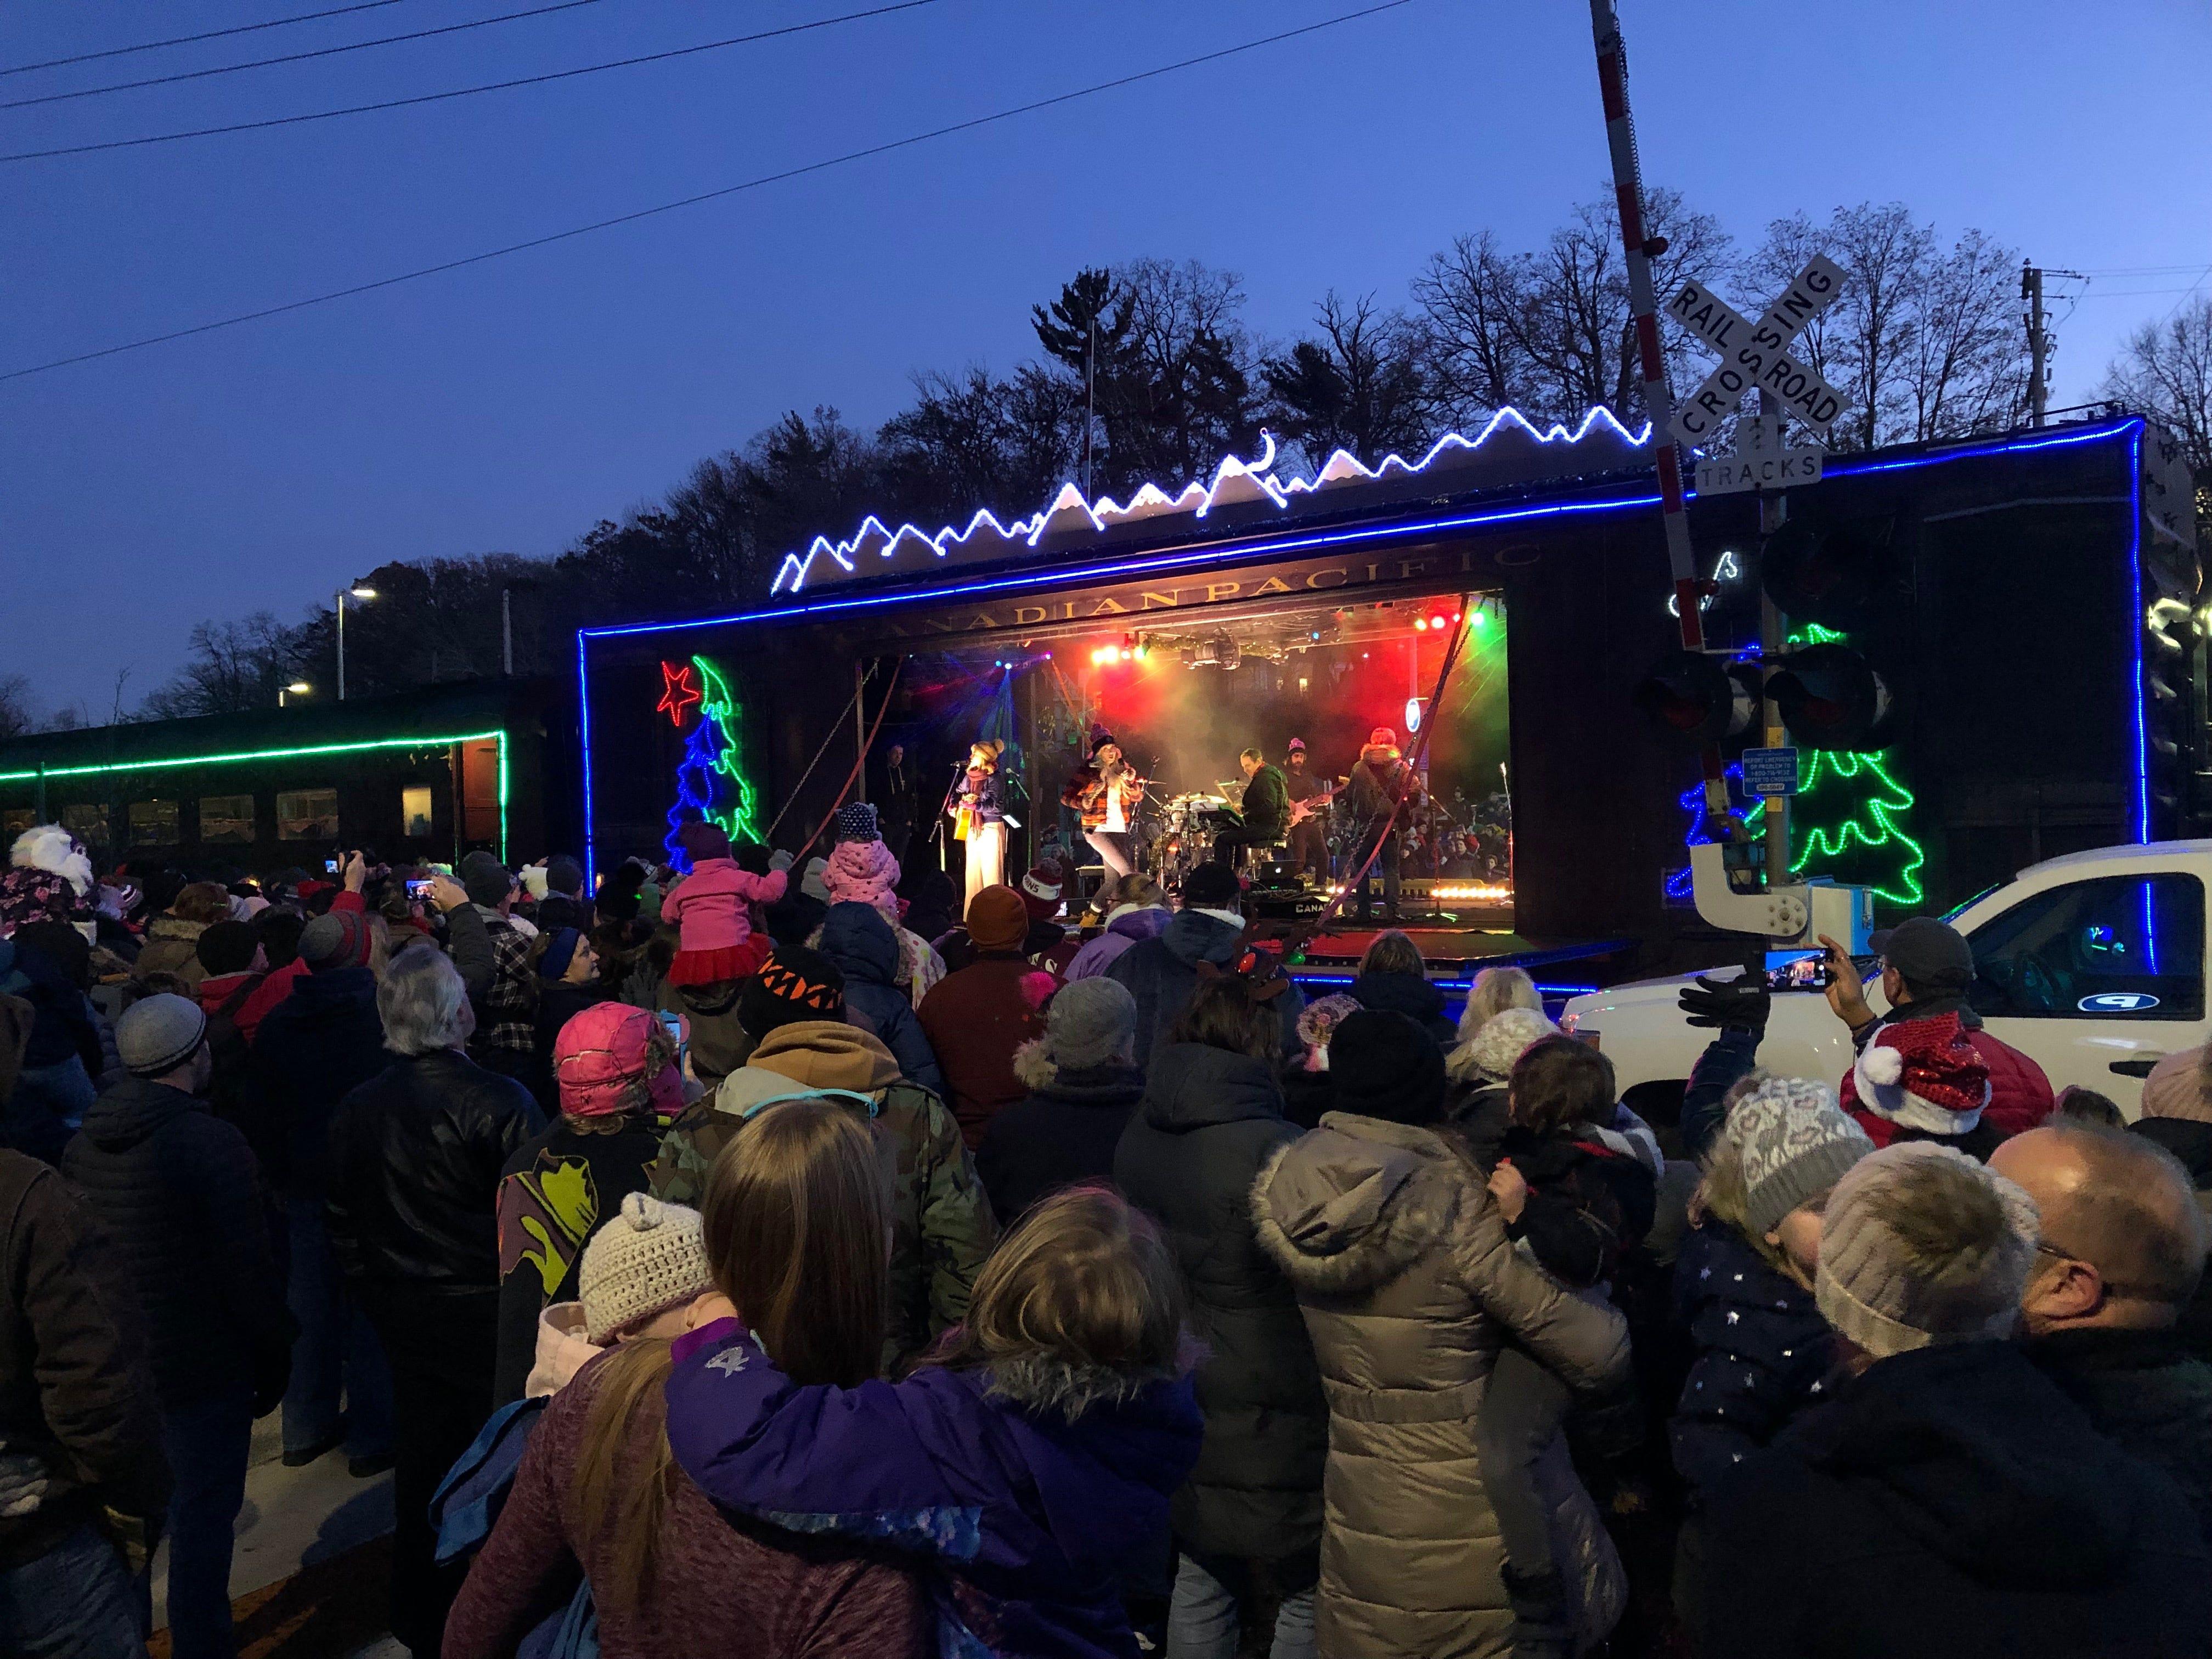 Wauwatosa Christmas Train 2020 Christmas train brings cheer to downtown Wauwatosa